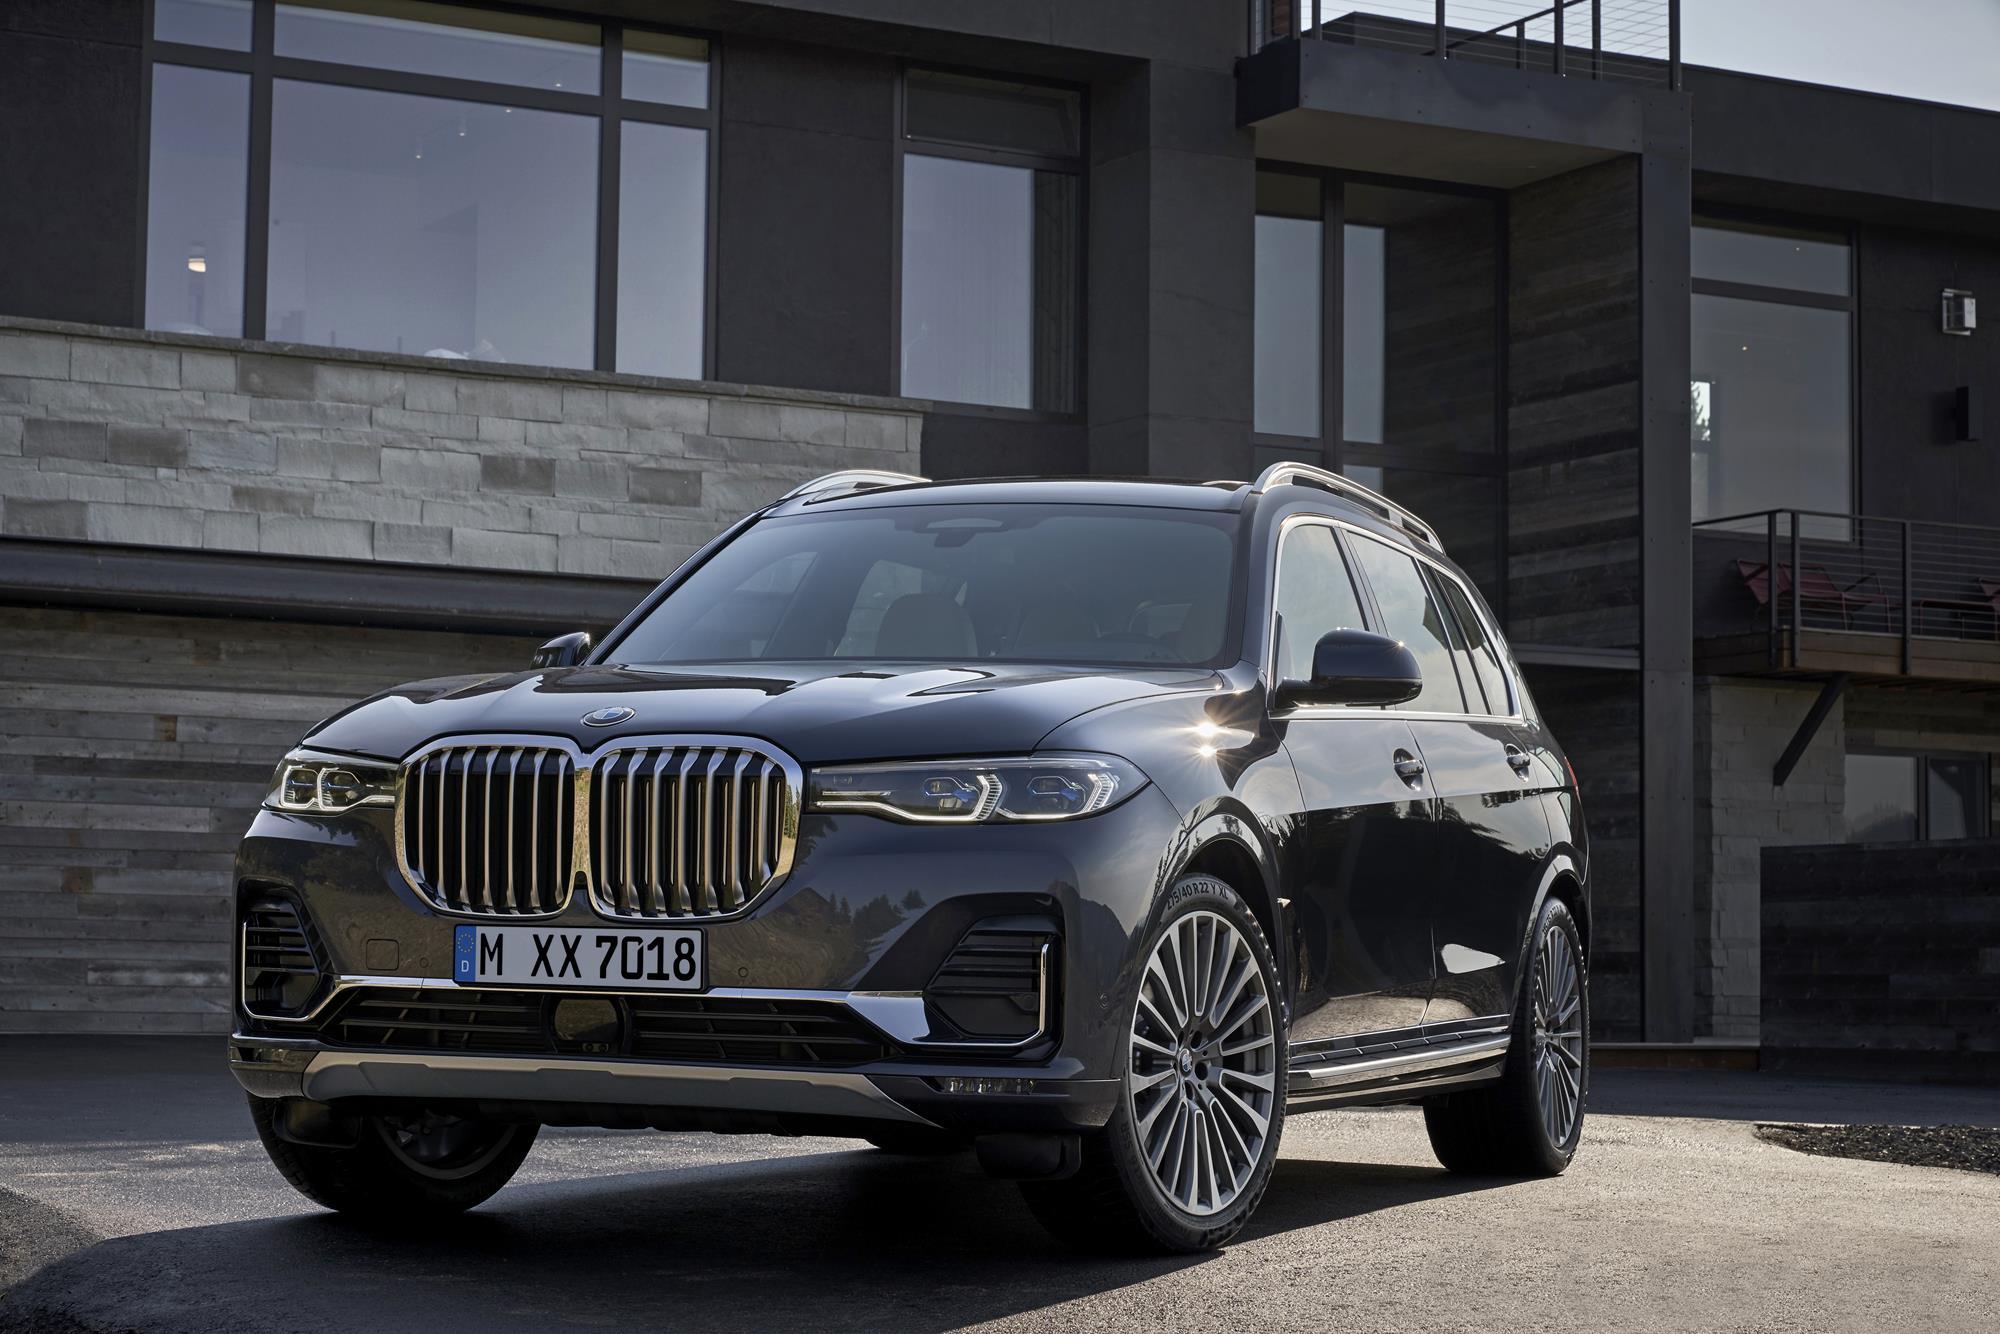 Permalink to BMW Reveals 2019 X7 Fullsize SUV, X5 M Performance Parts